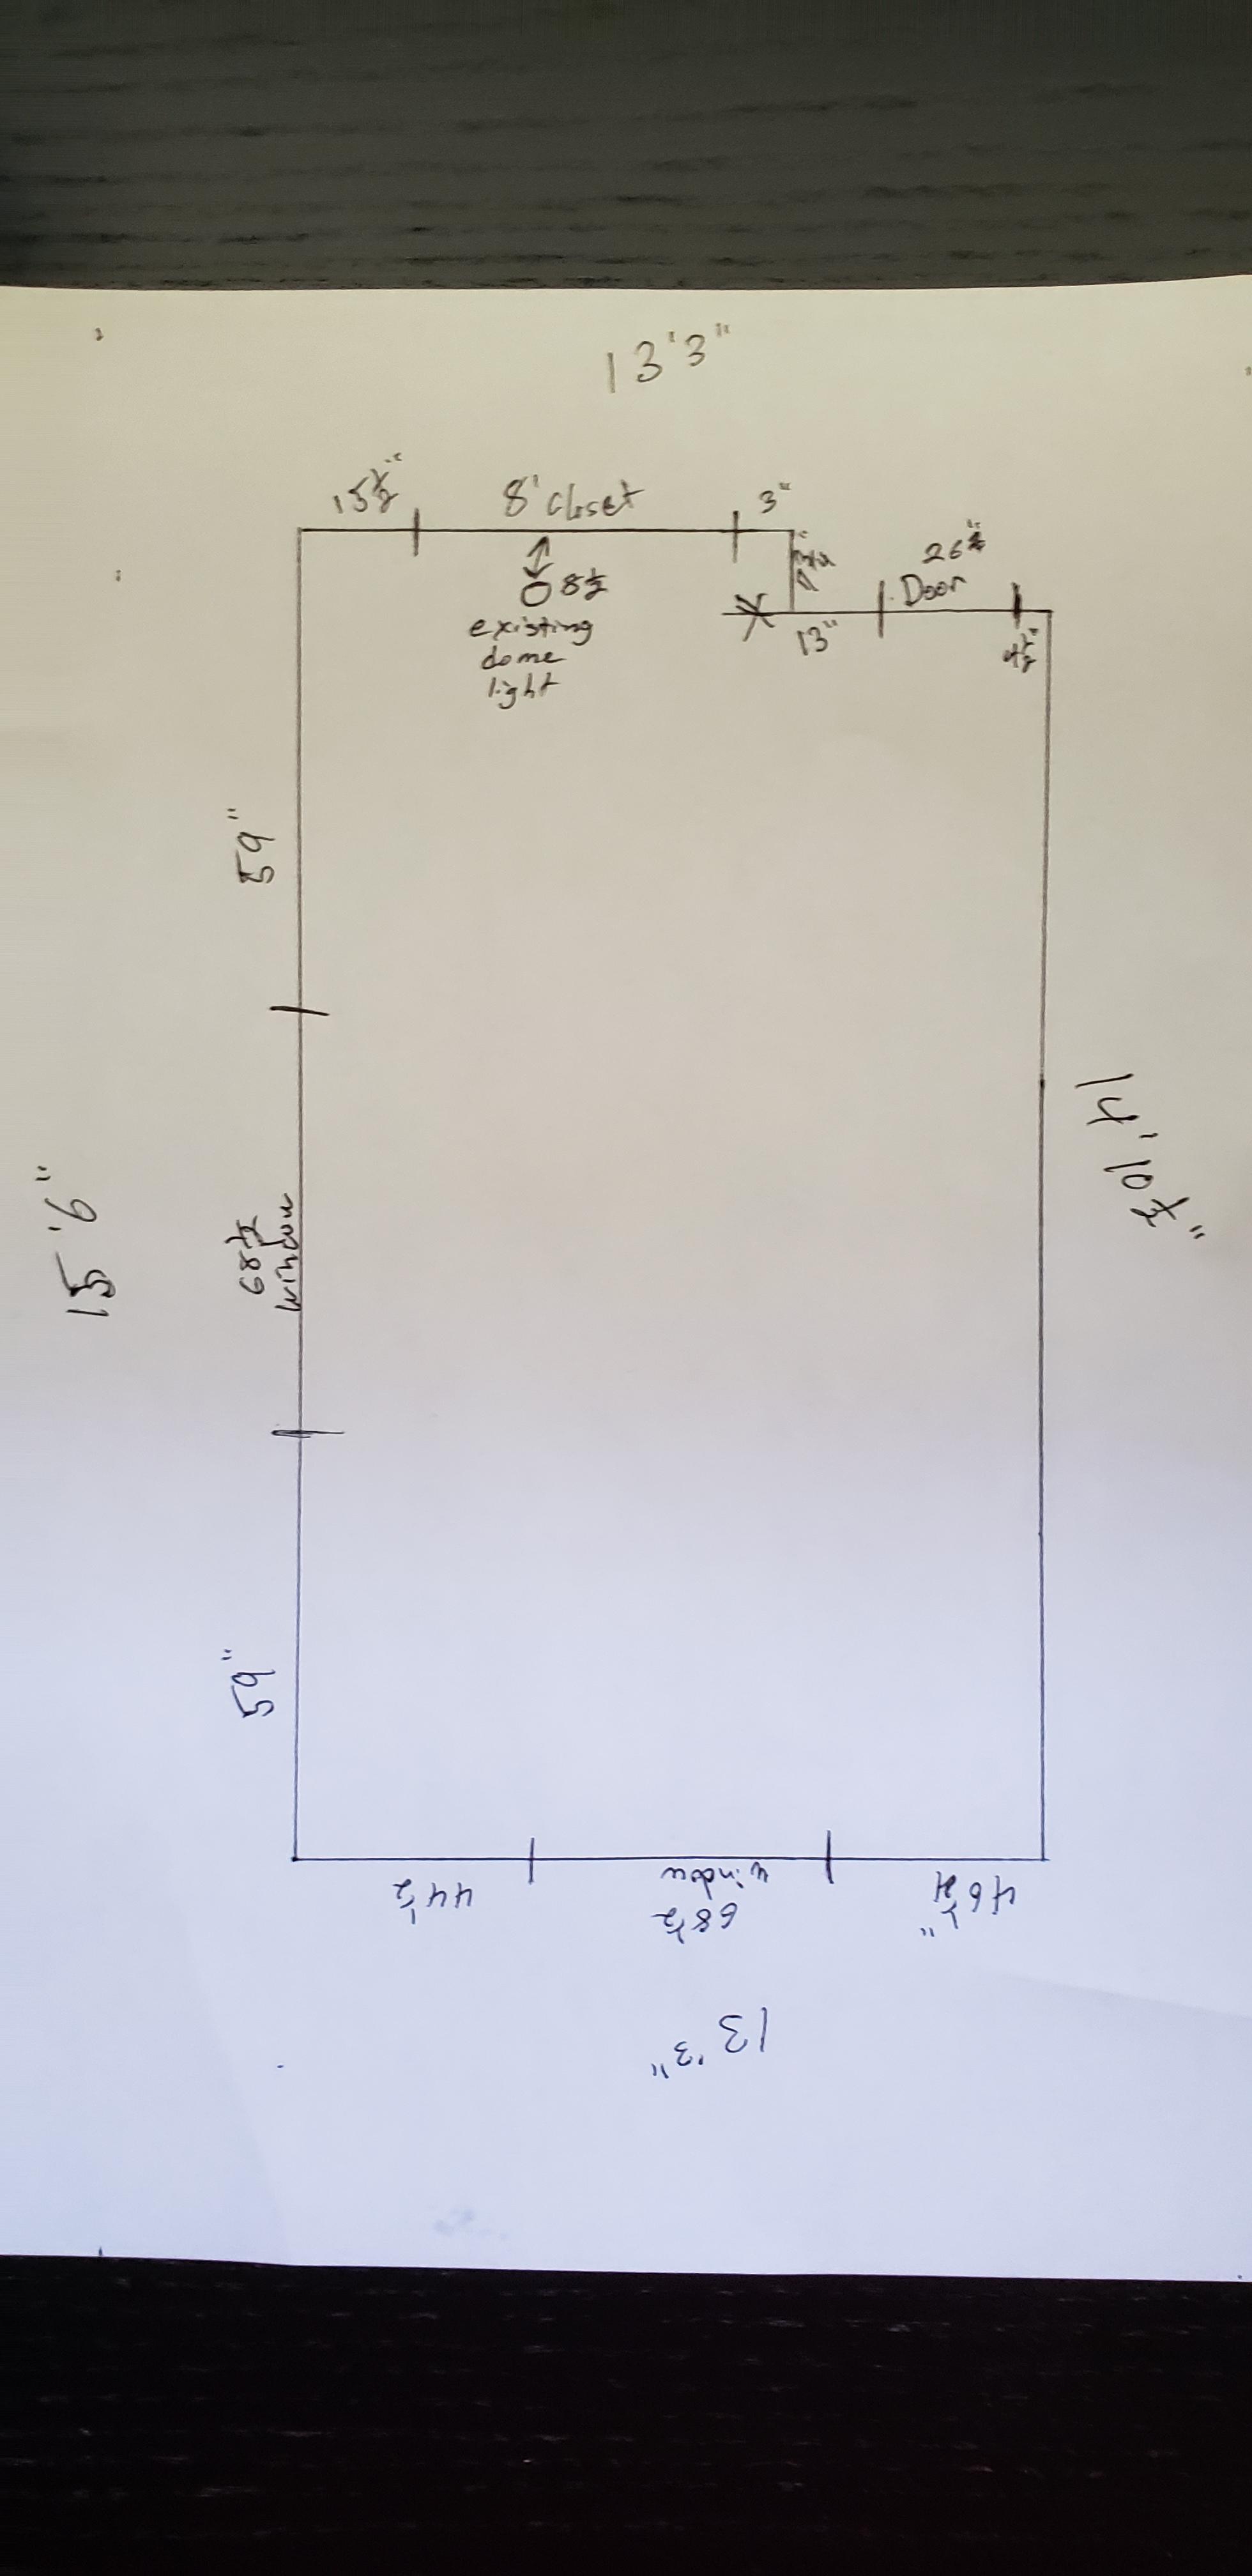 bedroom recessed lighting layout help